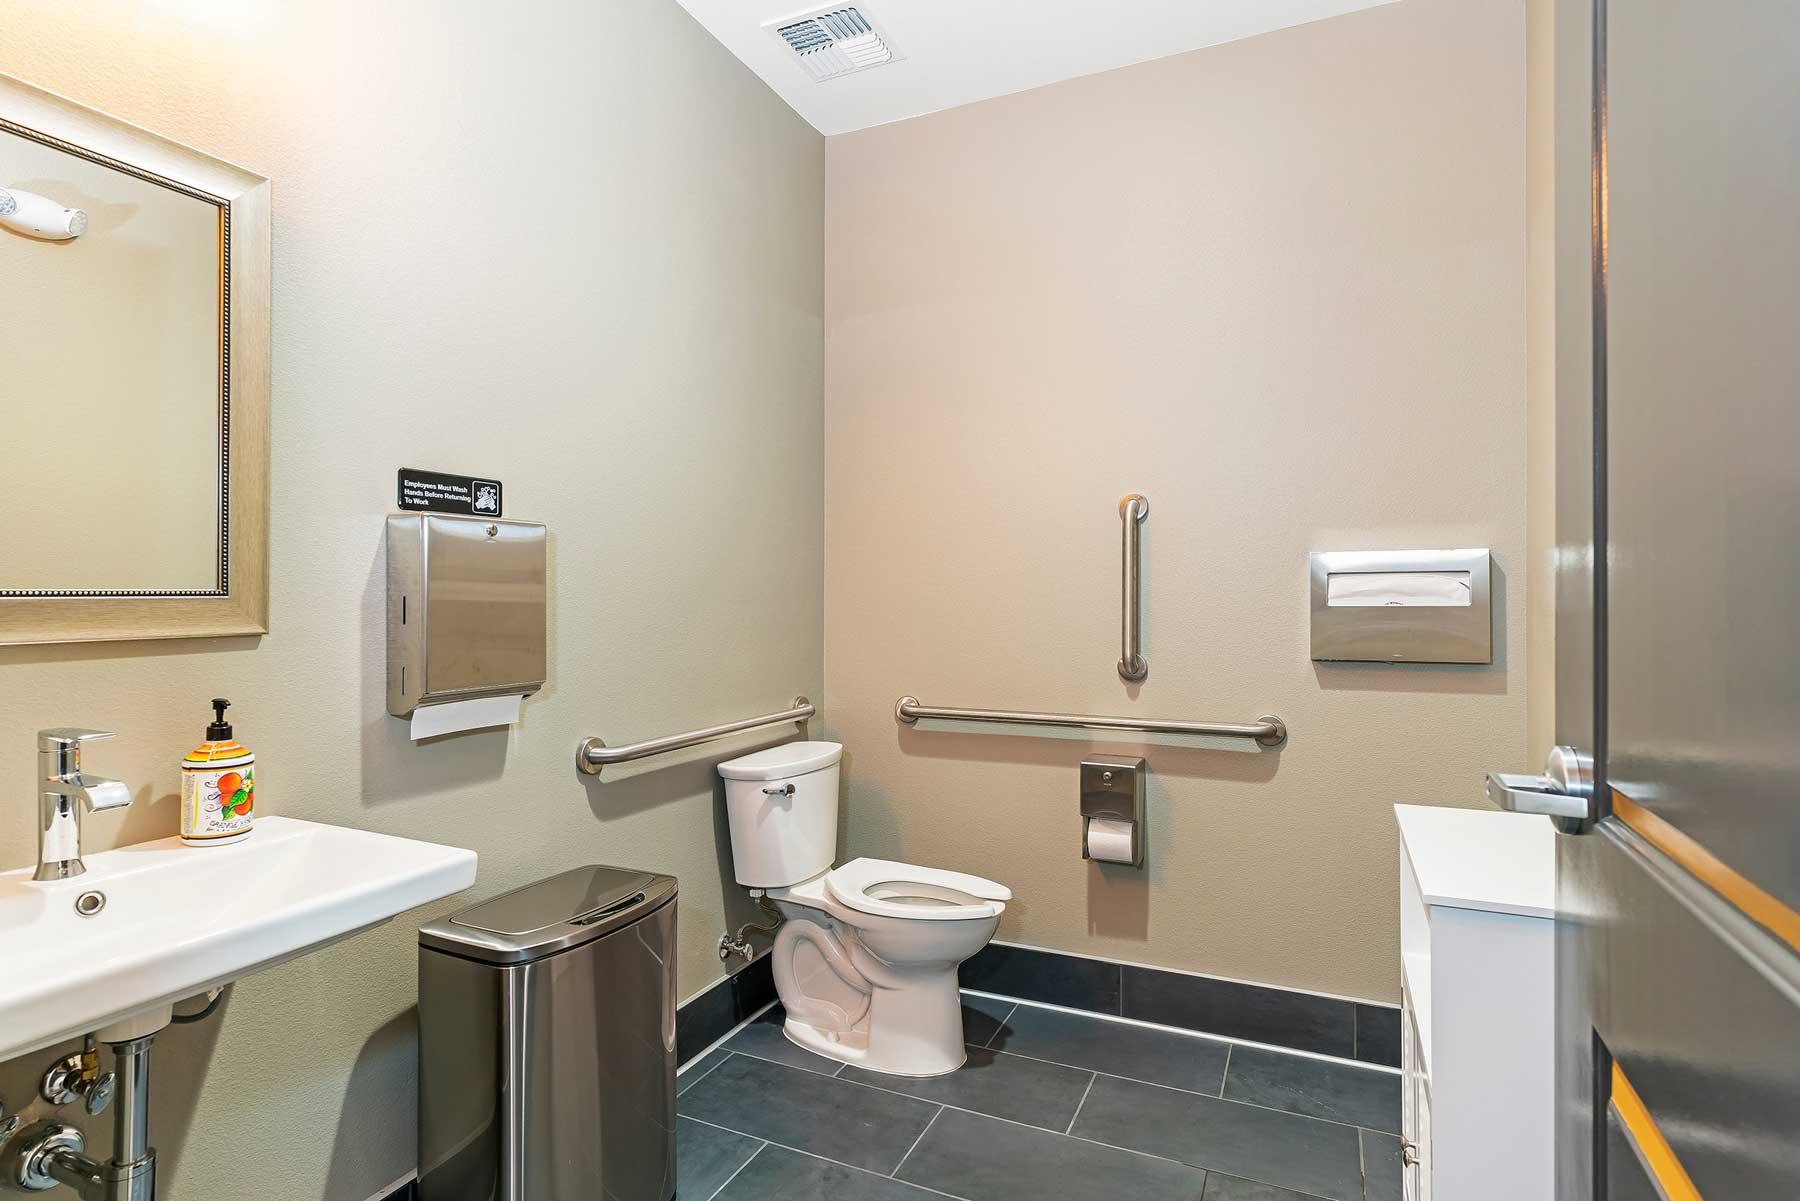 tenant improvement